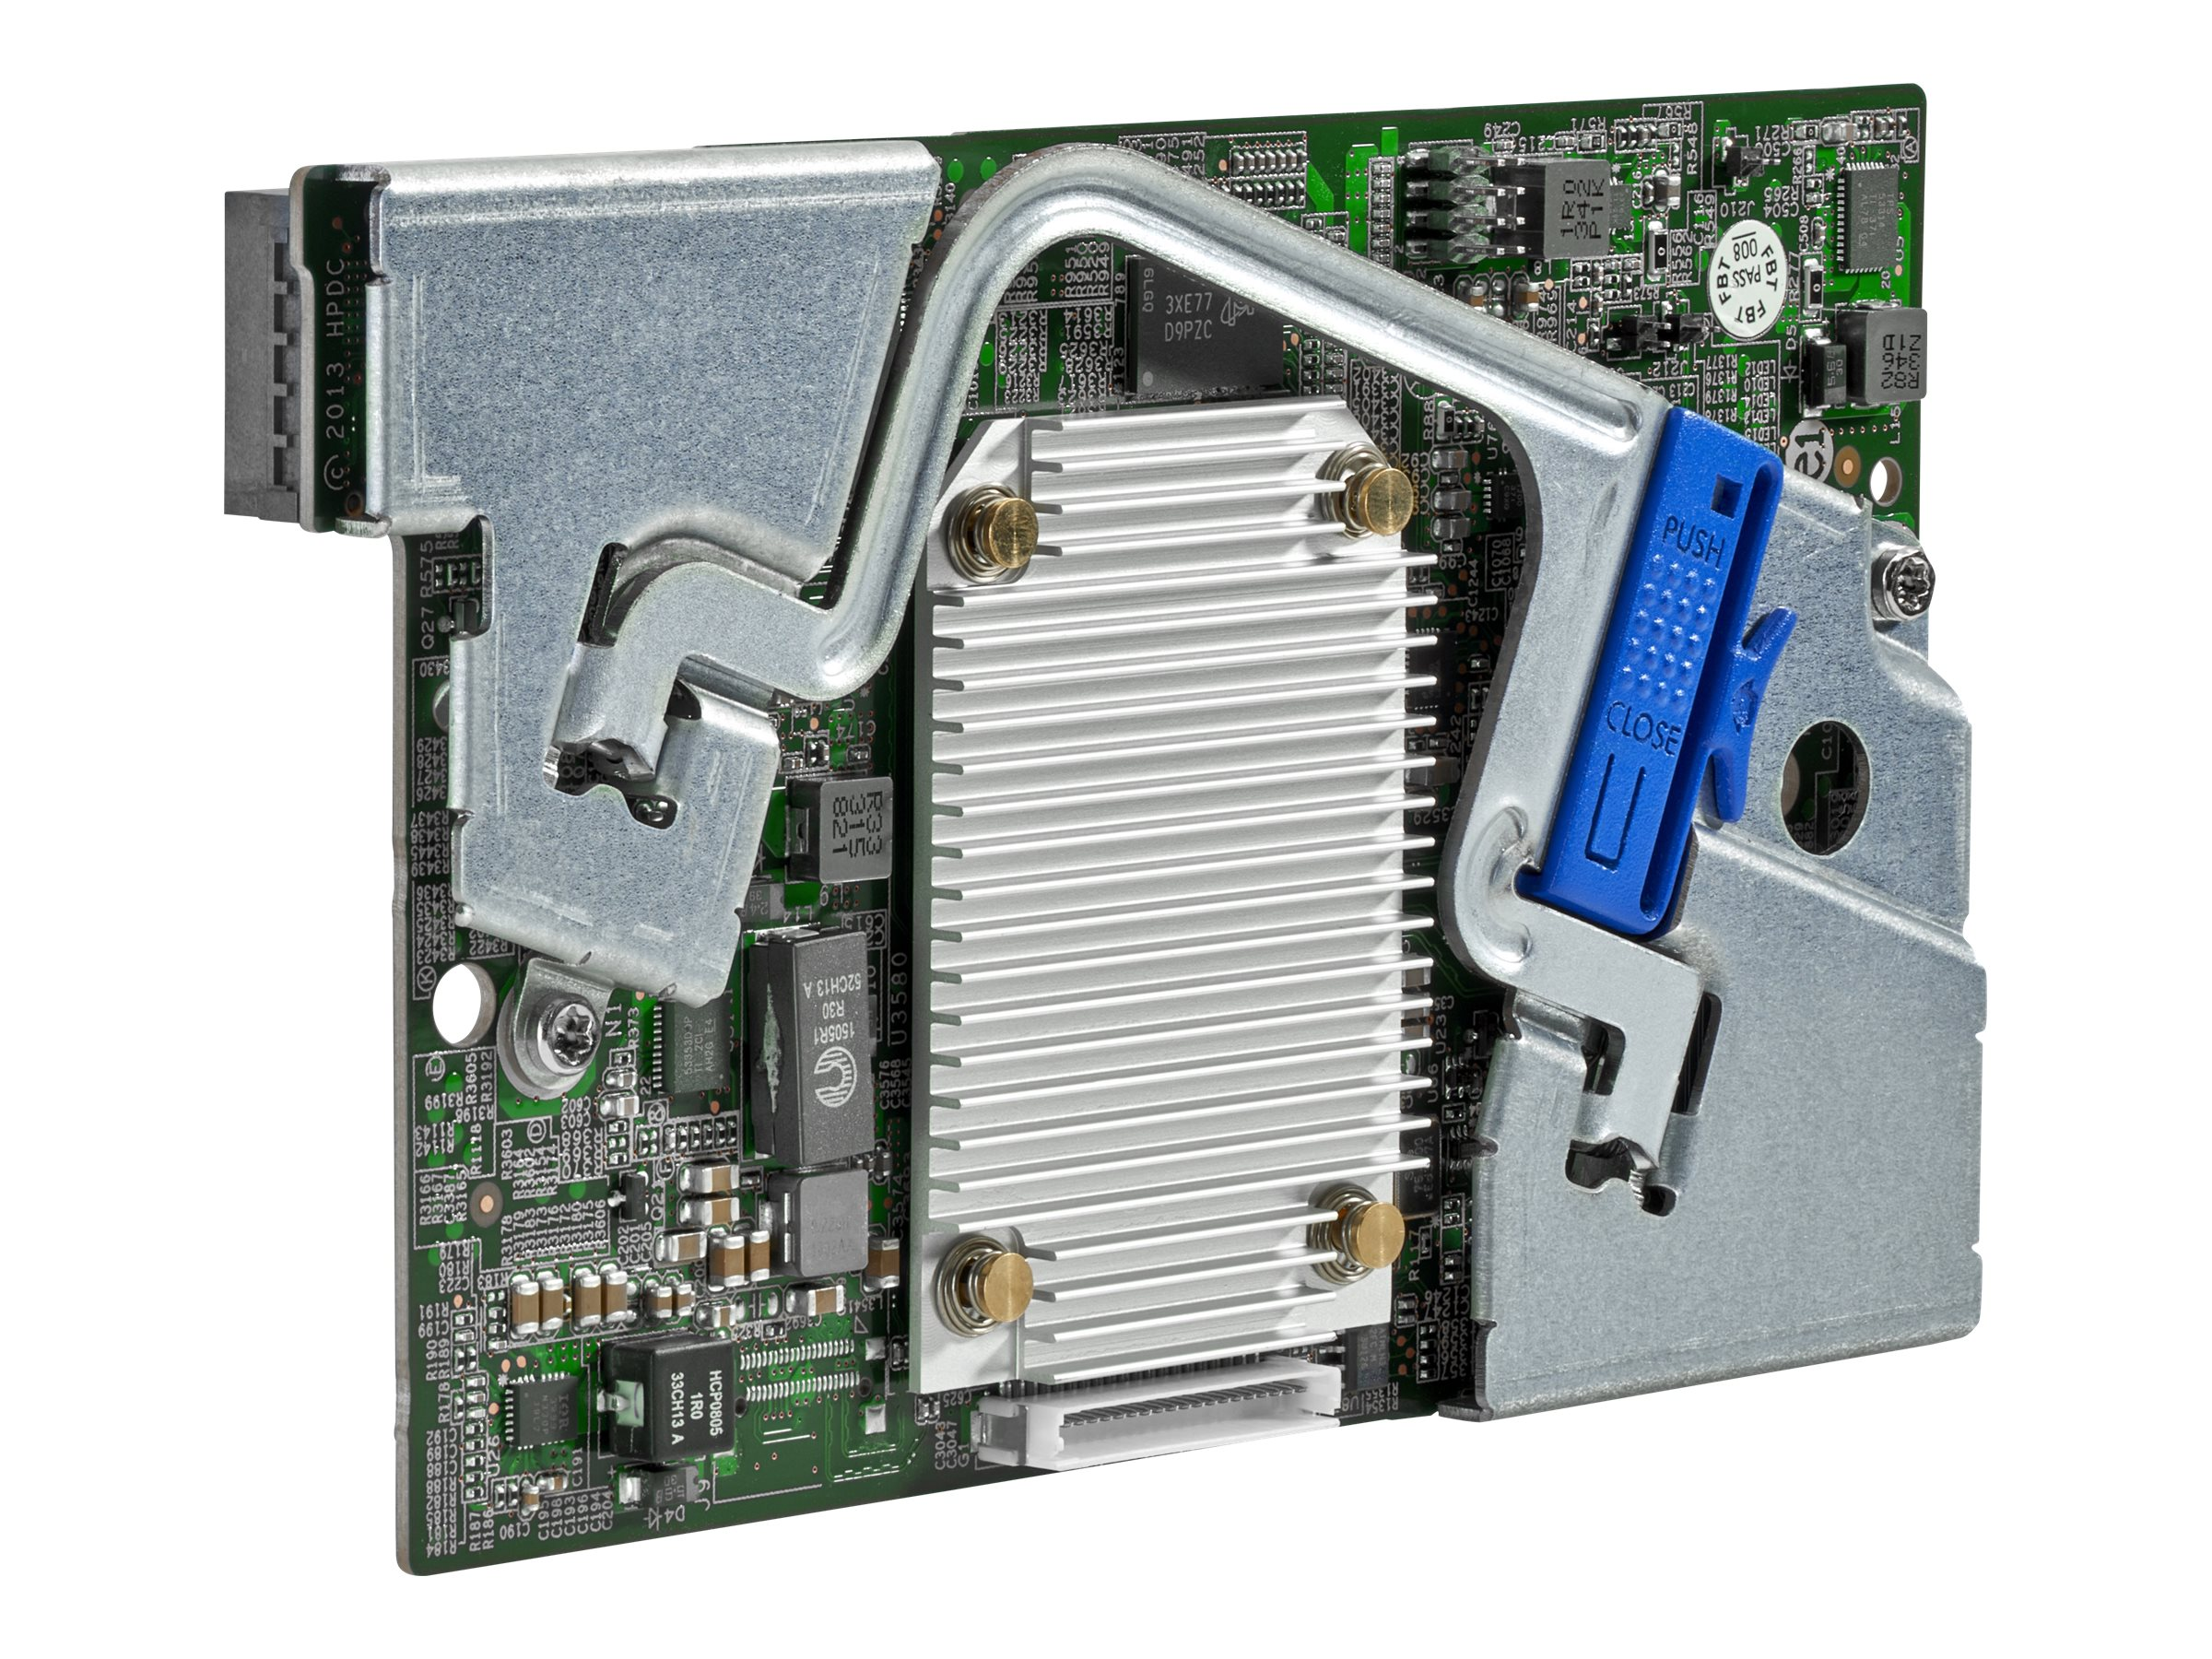 HPE Smart Array P244br/1G FBWC - Speichercontroller (RAID) - 2 Sender/Kanal - SATA 6Gb/s / SAS 12Gb/s - 12 Gbit/s - RAID 0, 1, 1